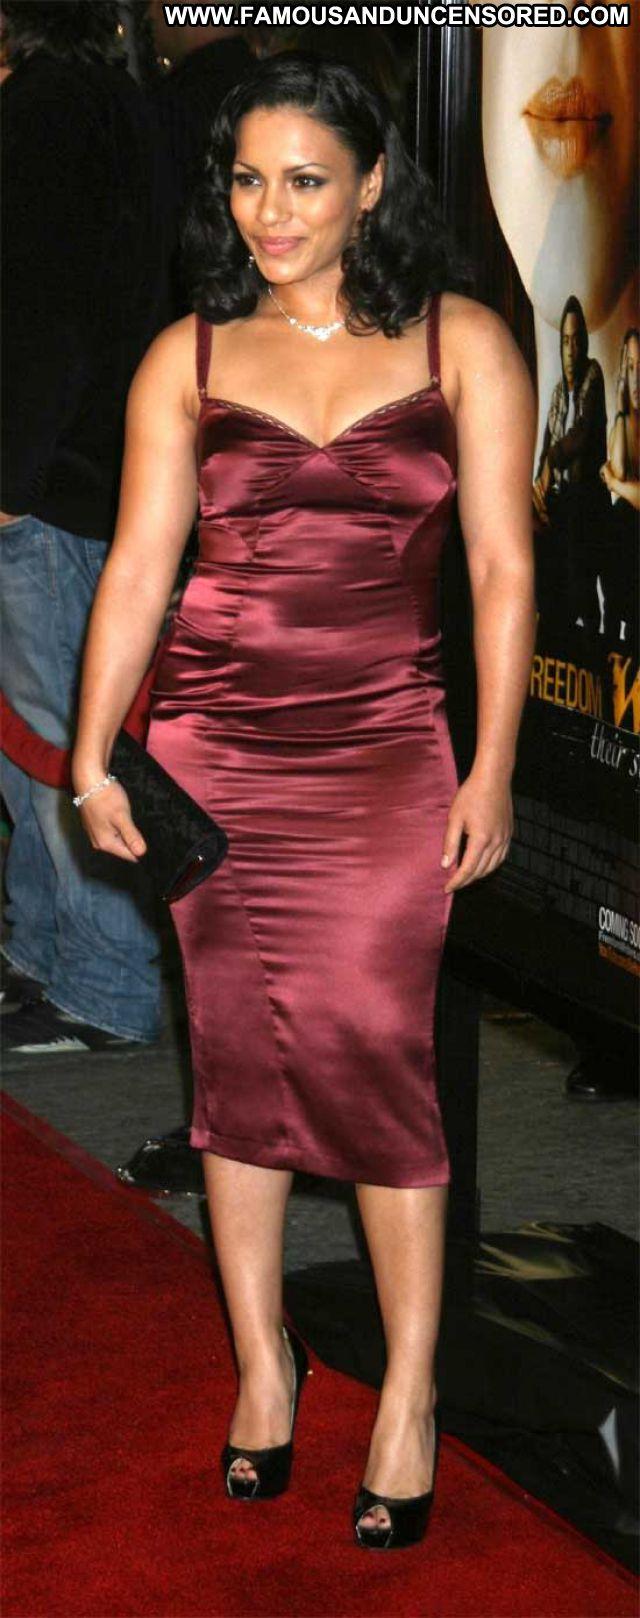 April Hernandez No Source Posing Hot Latina Babe Brunette Hot Ass